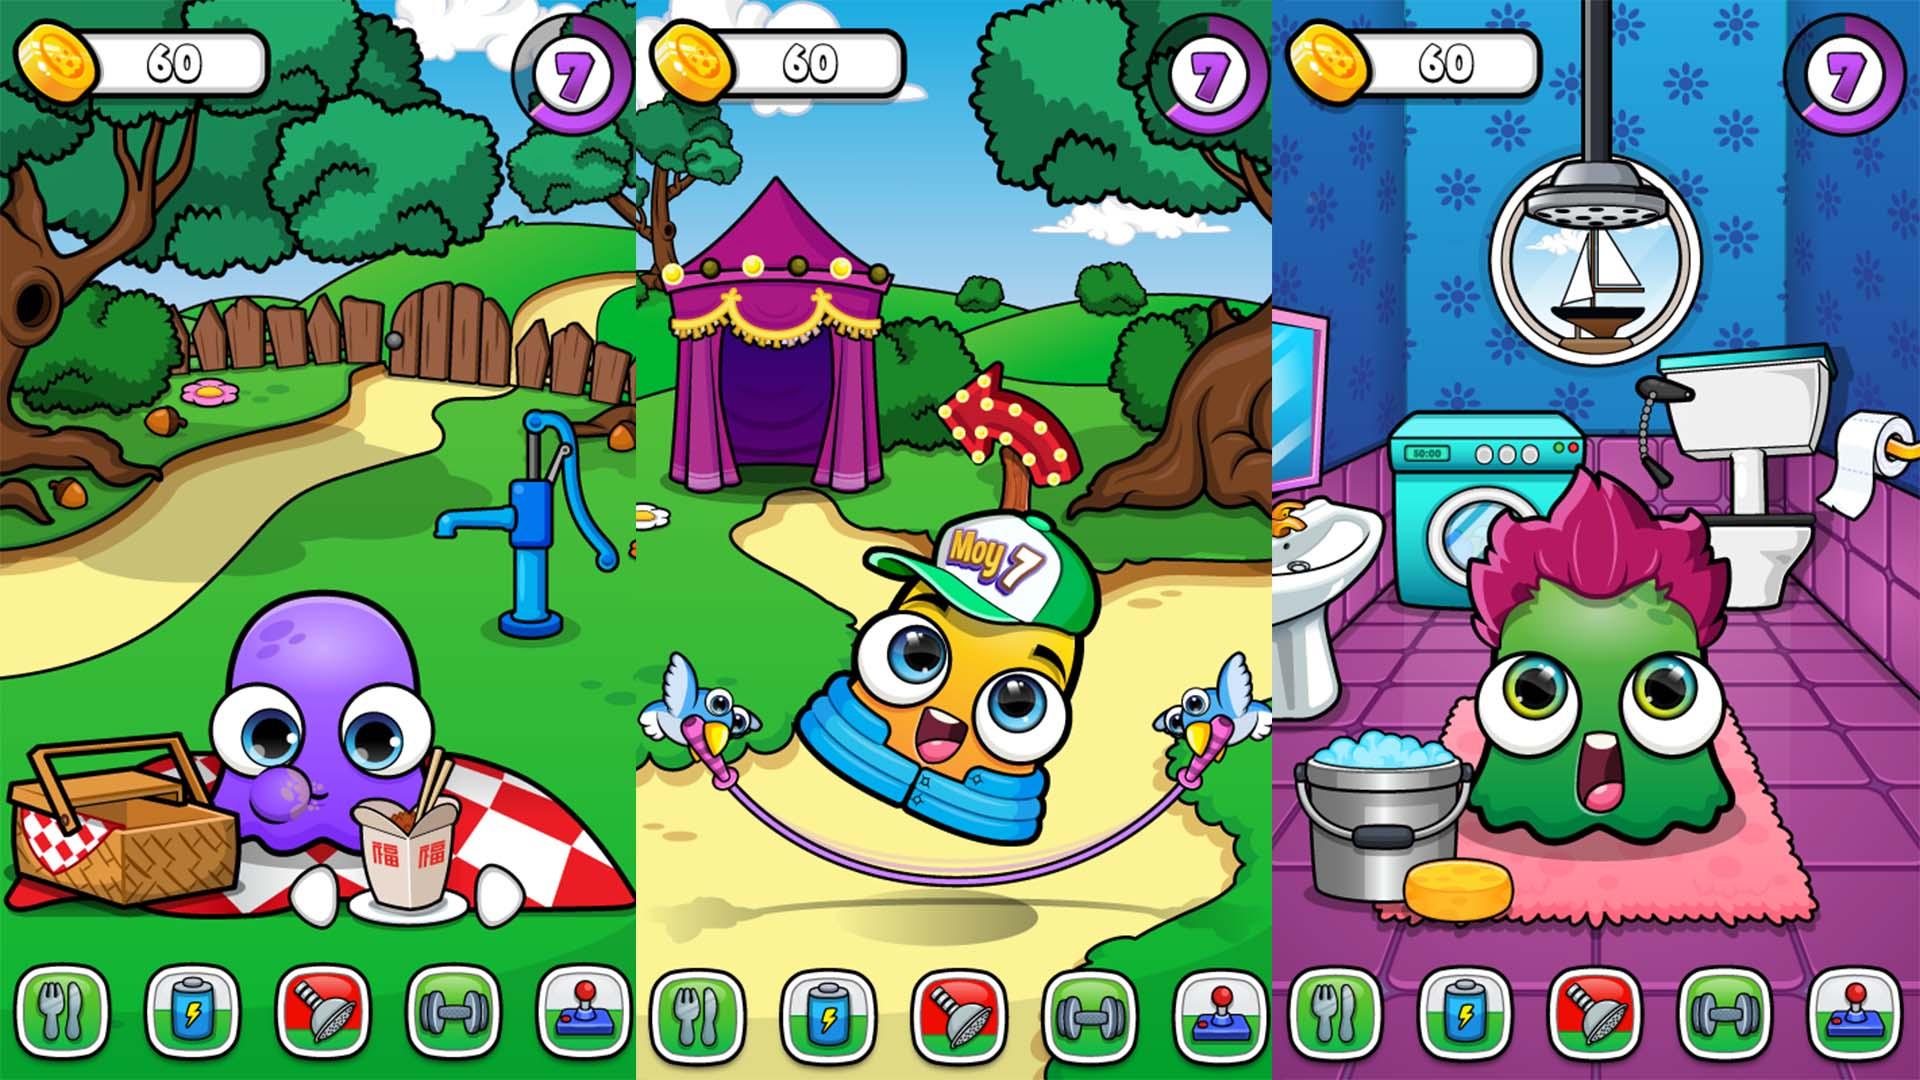 Moy 7 screenshot 2020